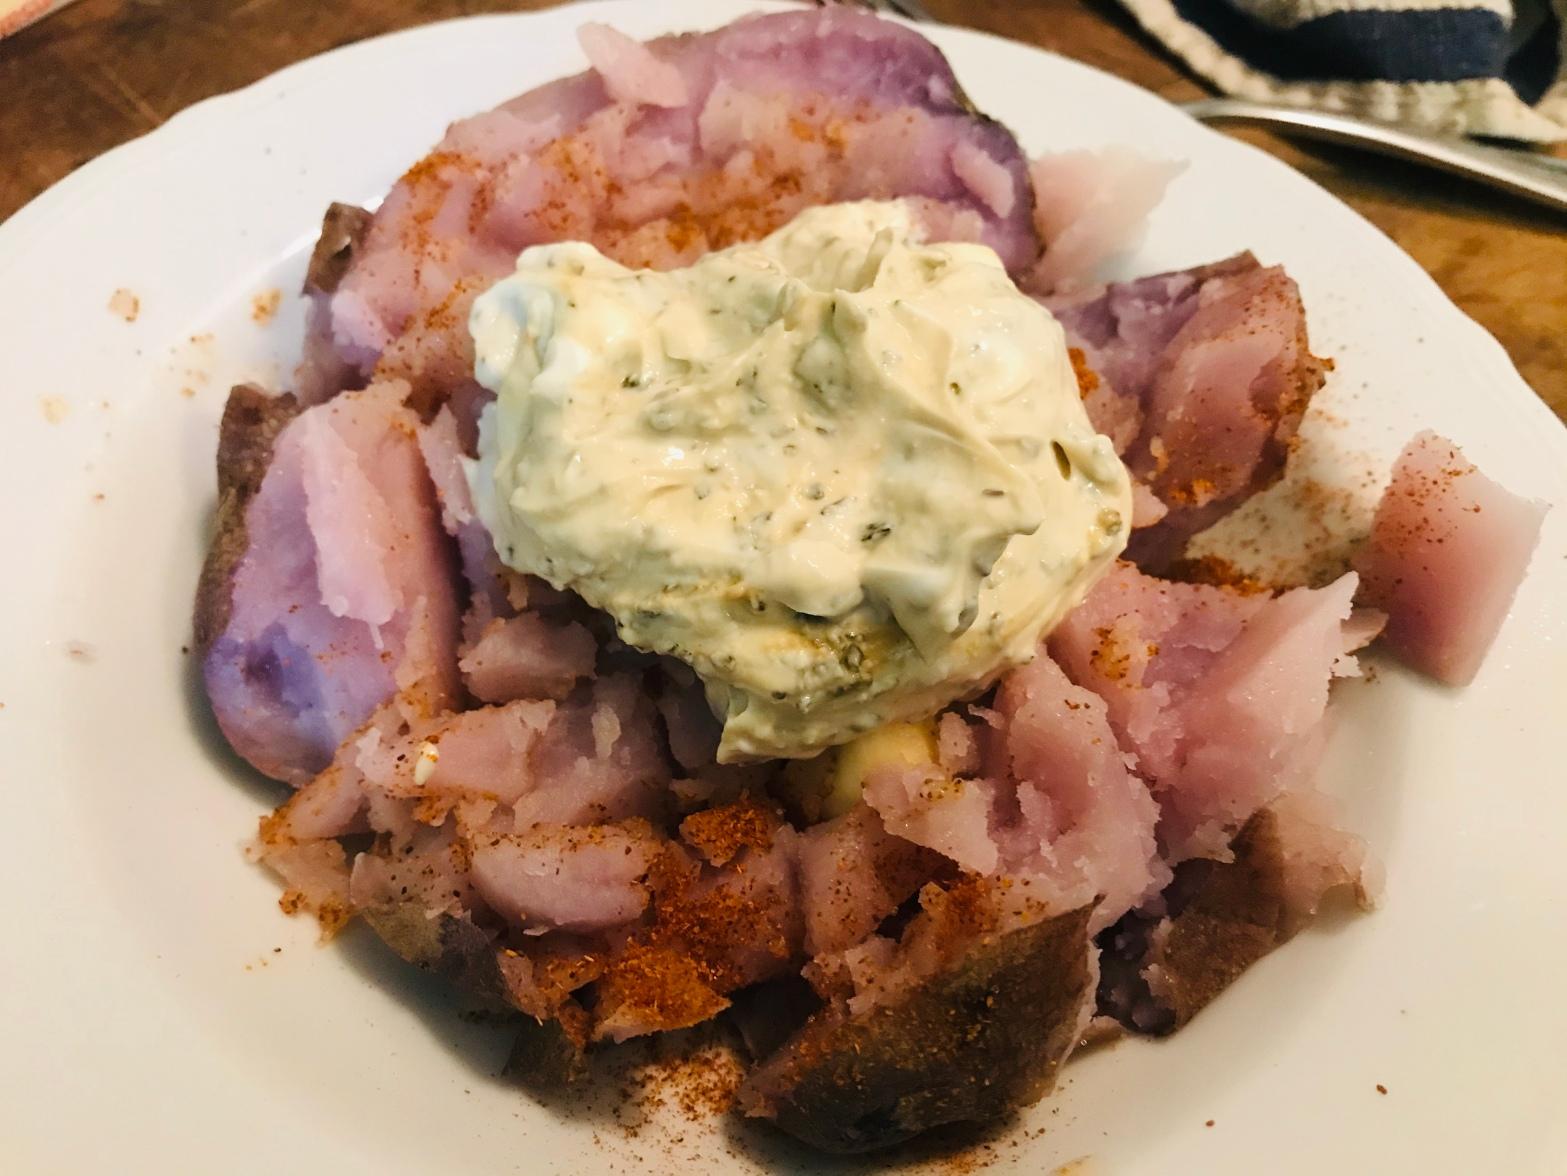 Sweet potato with a roasted cumin yogurt sauce